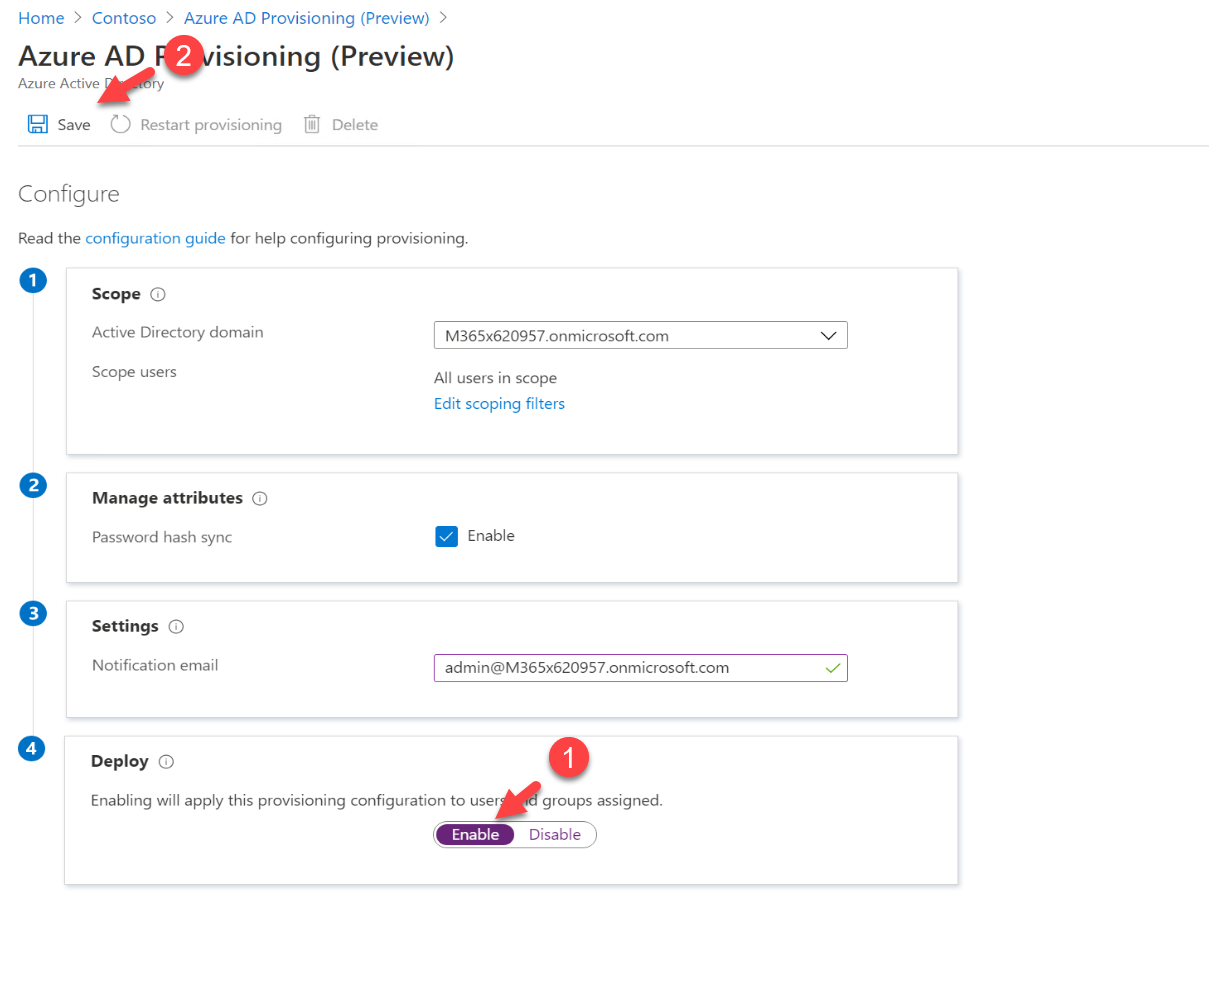 Azure AD Provisioning settings